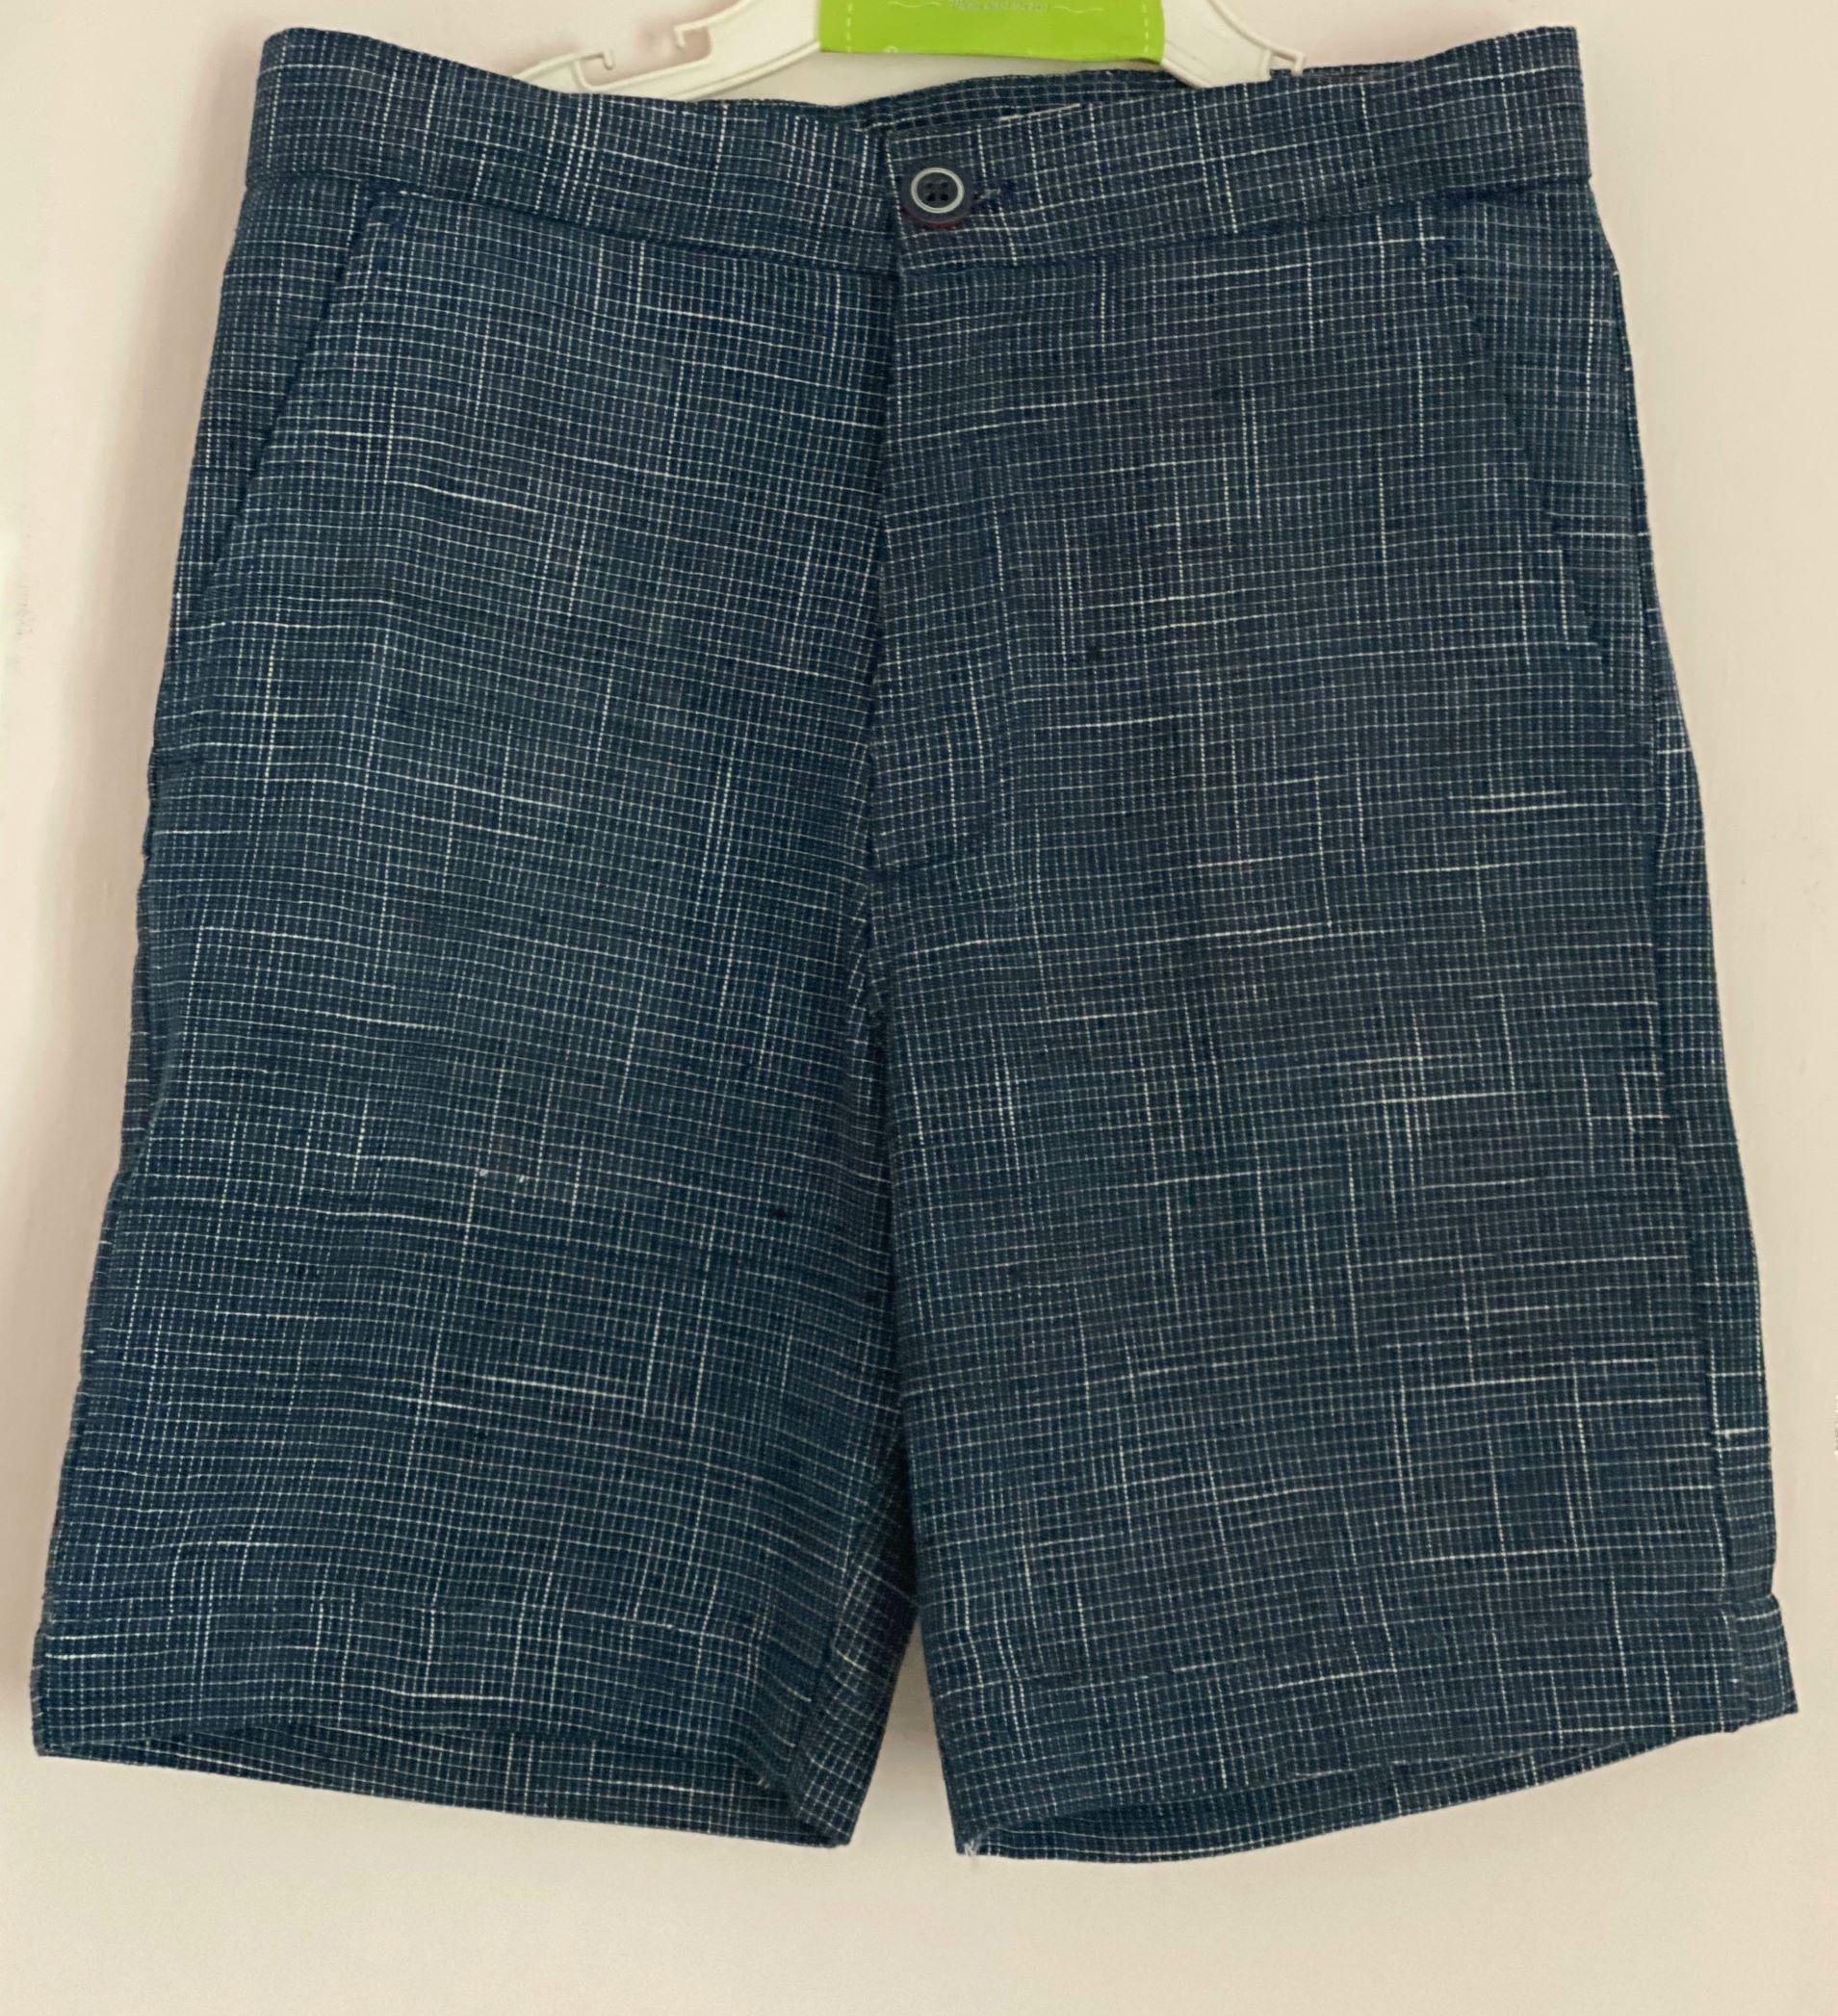 Ocean Splash shorts